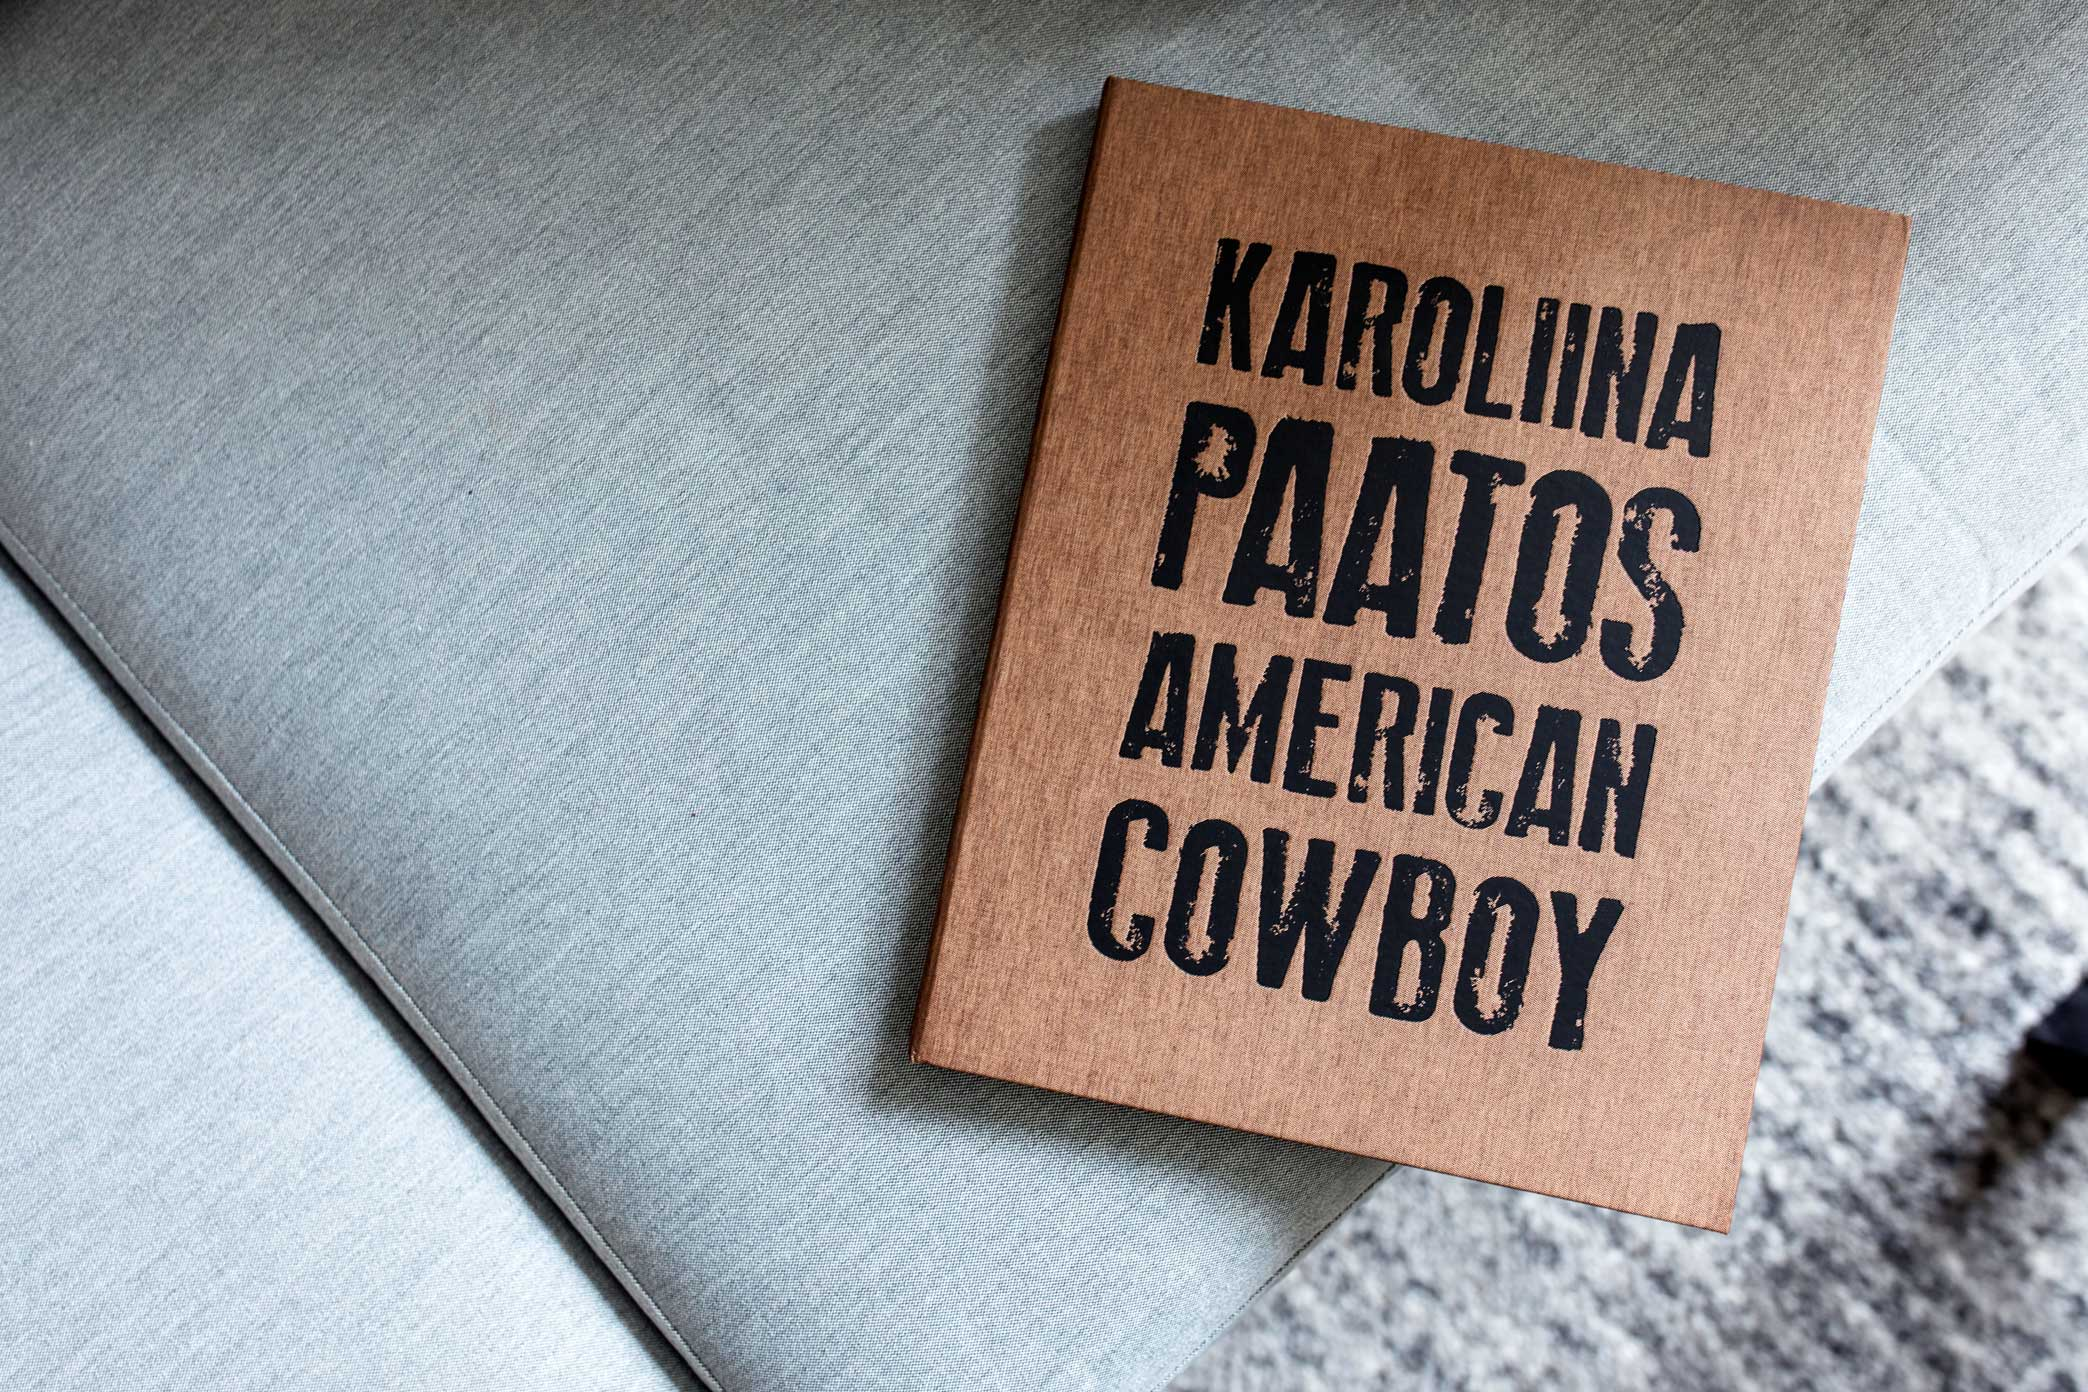 Coffee & A Photo Book - Karoliina Paatos' American Cowboy